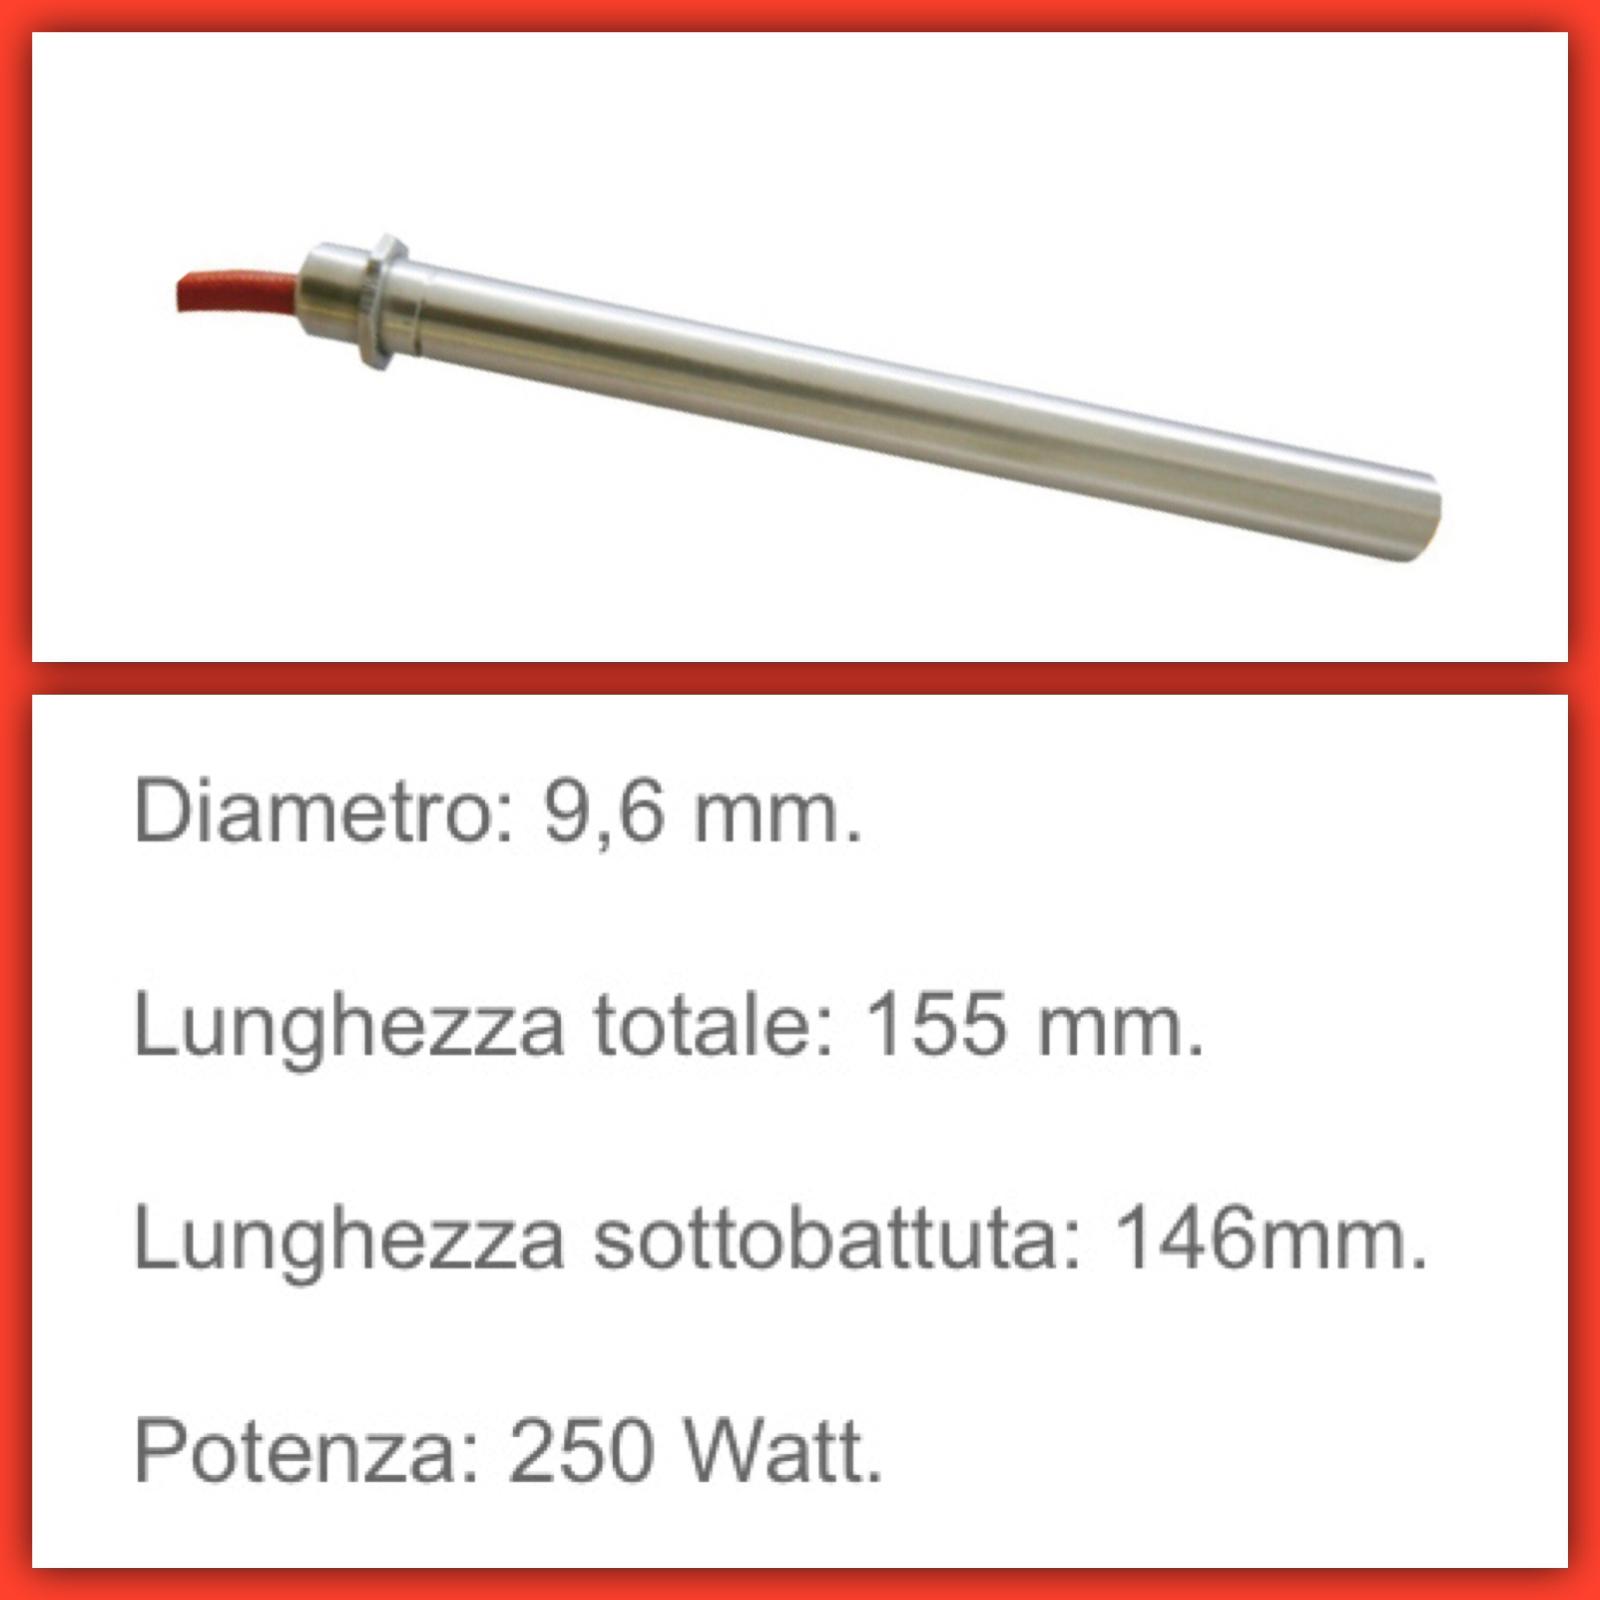 Resistenza accensione stufa pellet ECOFOREST 250 W Lung 155 tot 146 mm diam 9,6 2